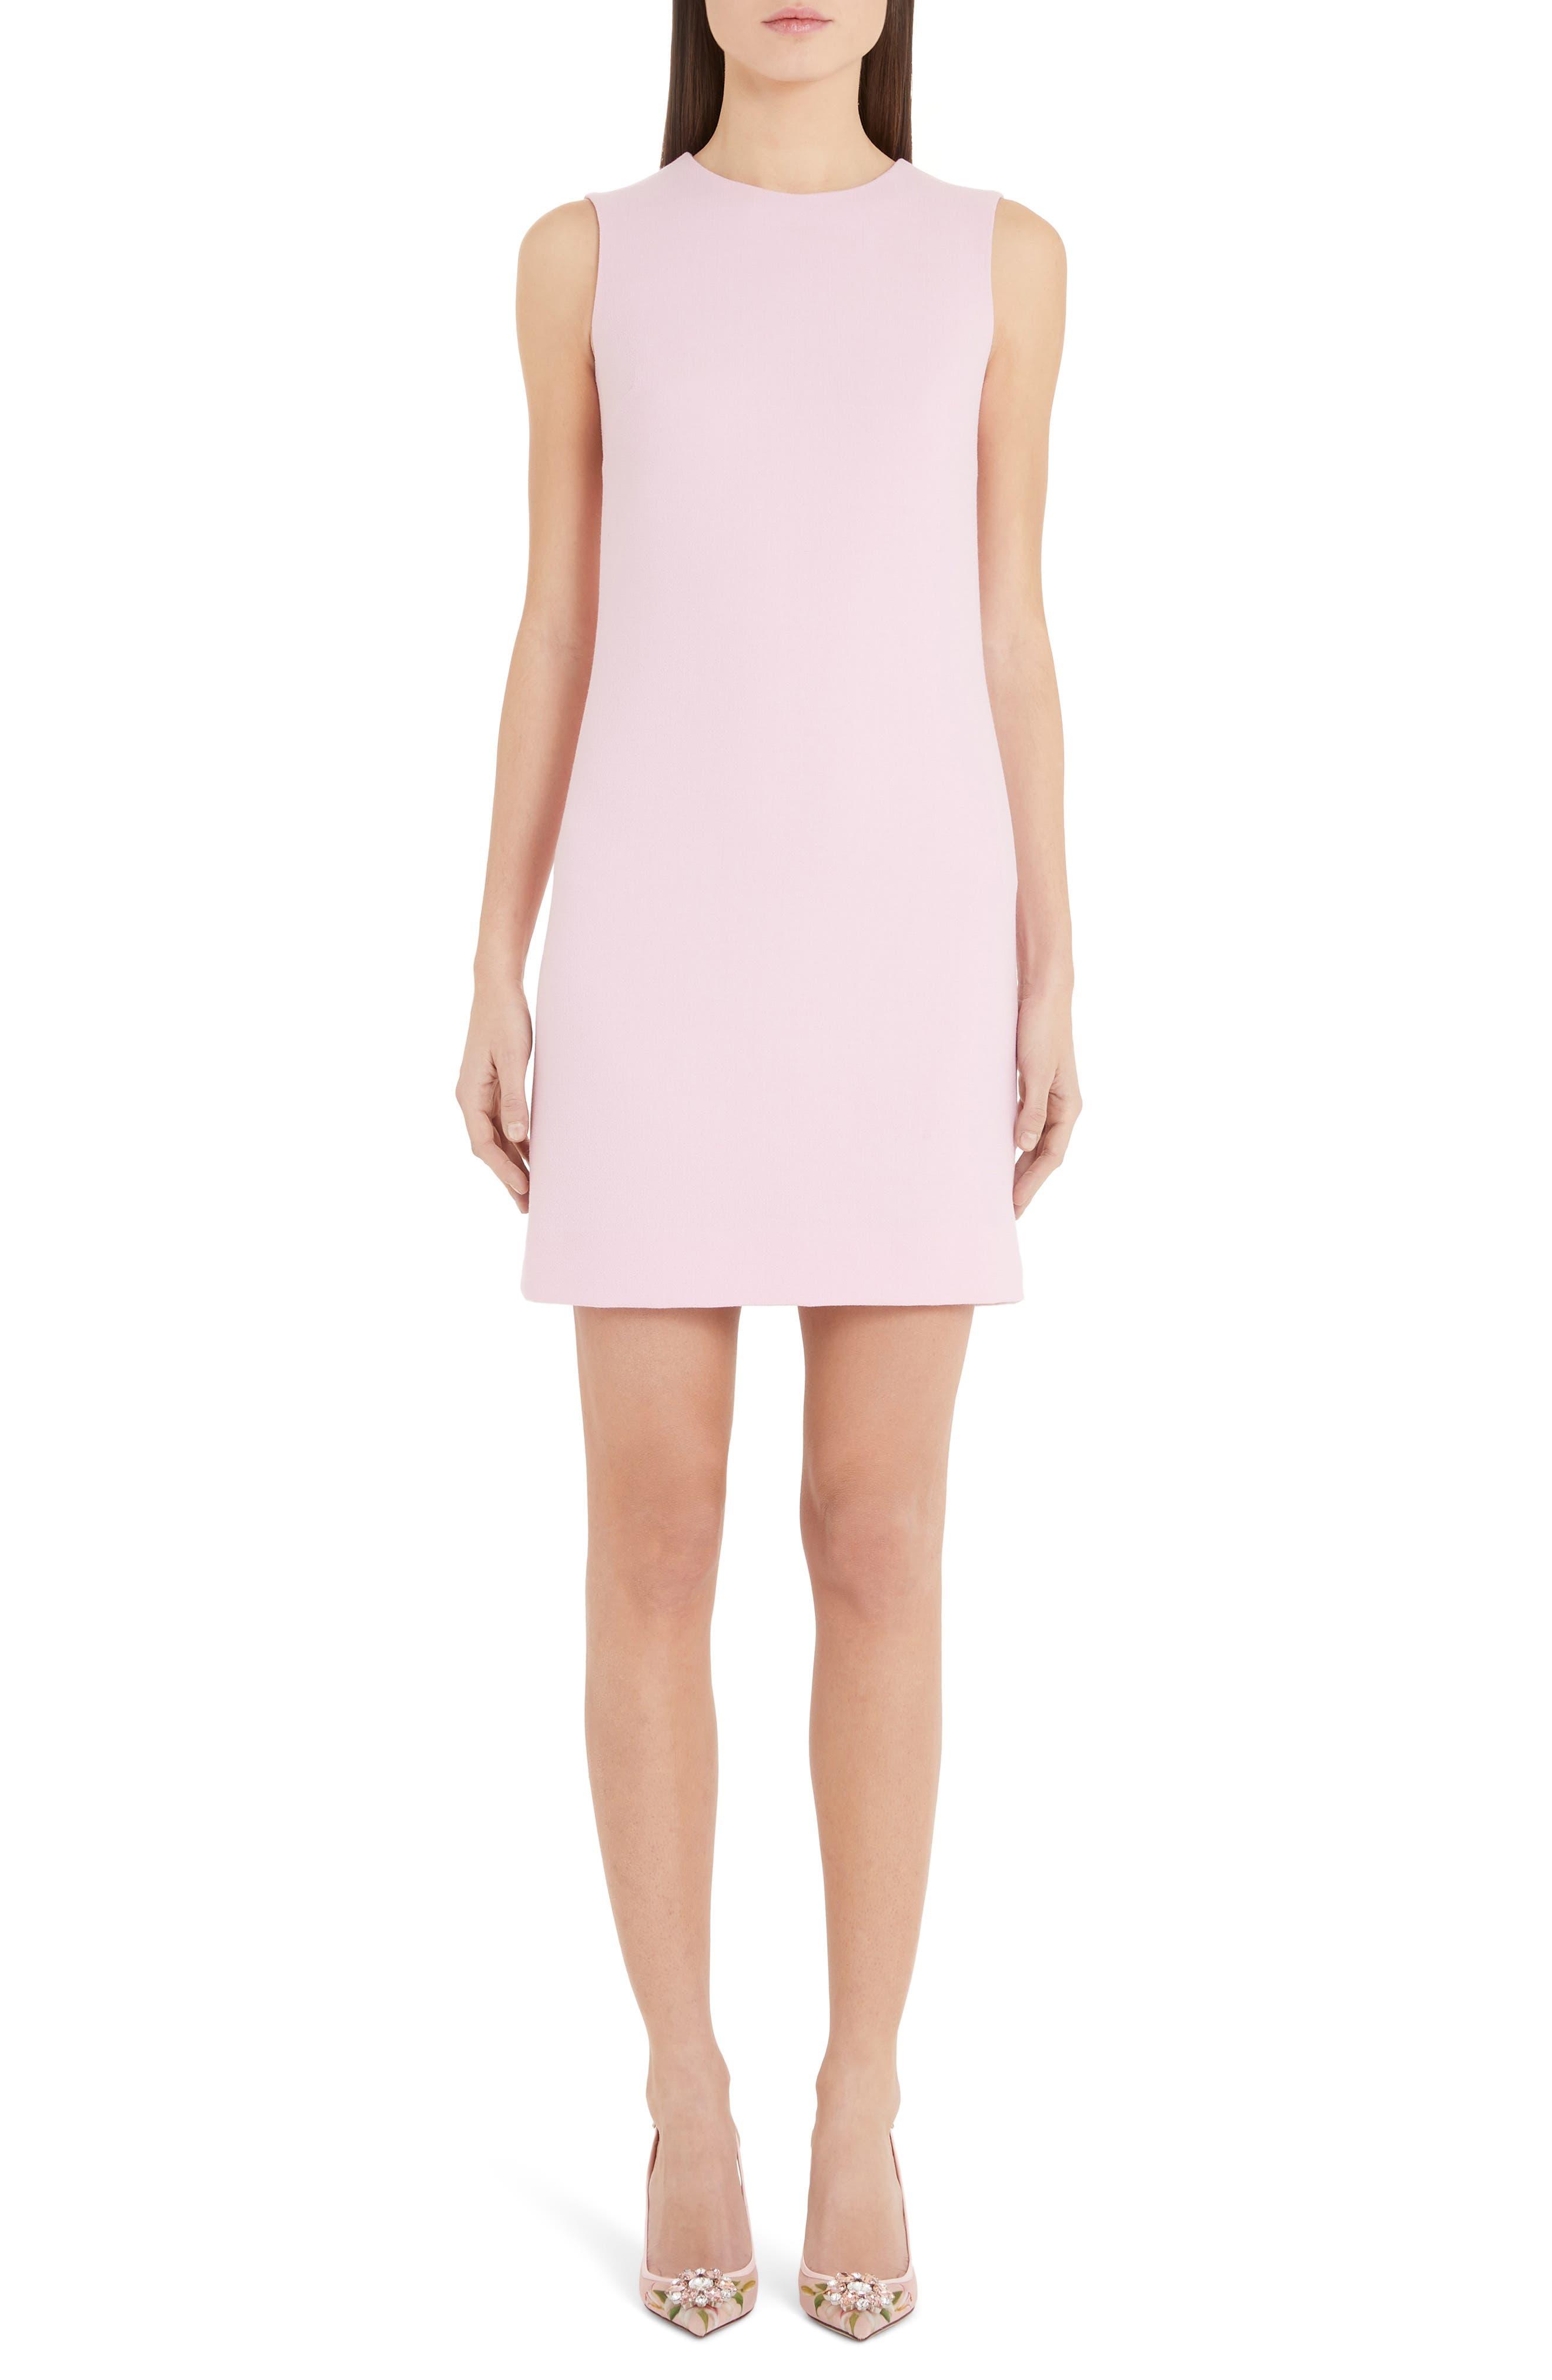 Dolce & gabbana Sheath Dress, US / 40 IT - Pink